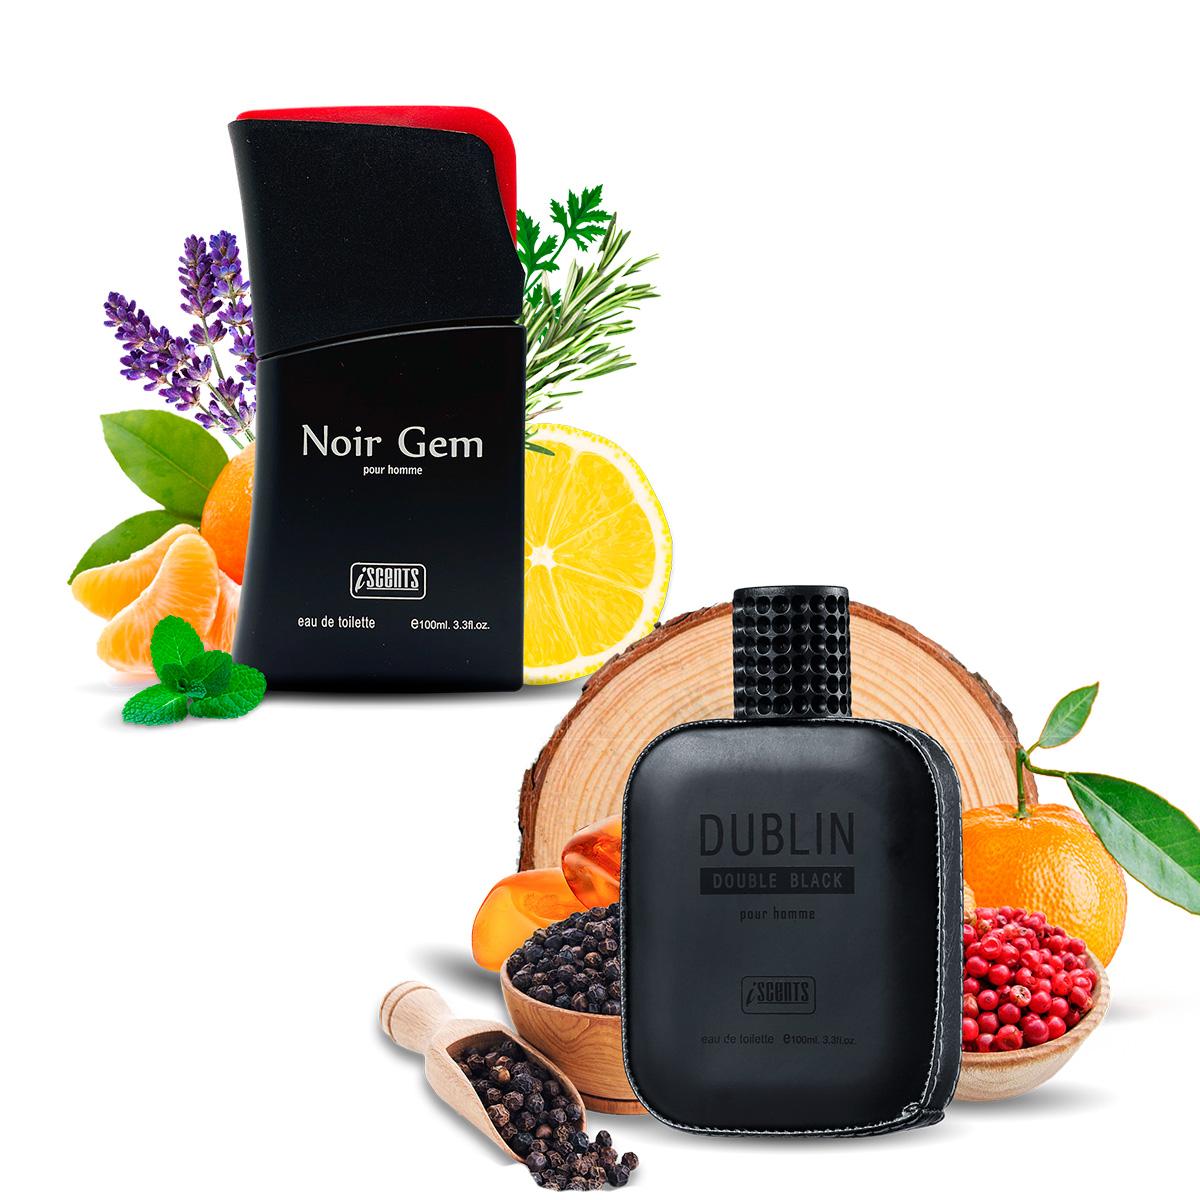 Kit 2 Perfumes Importados Noir Gem e Dublin I Scents